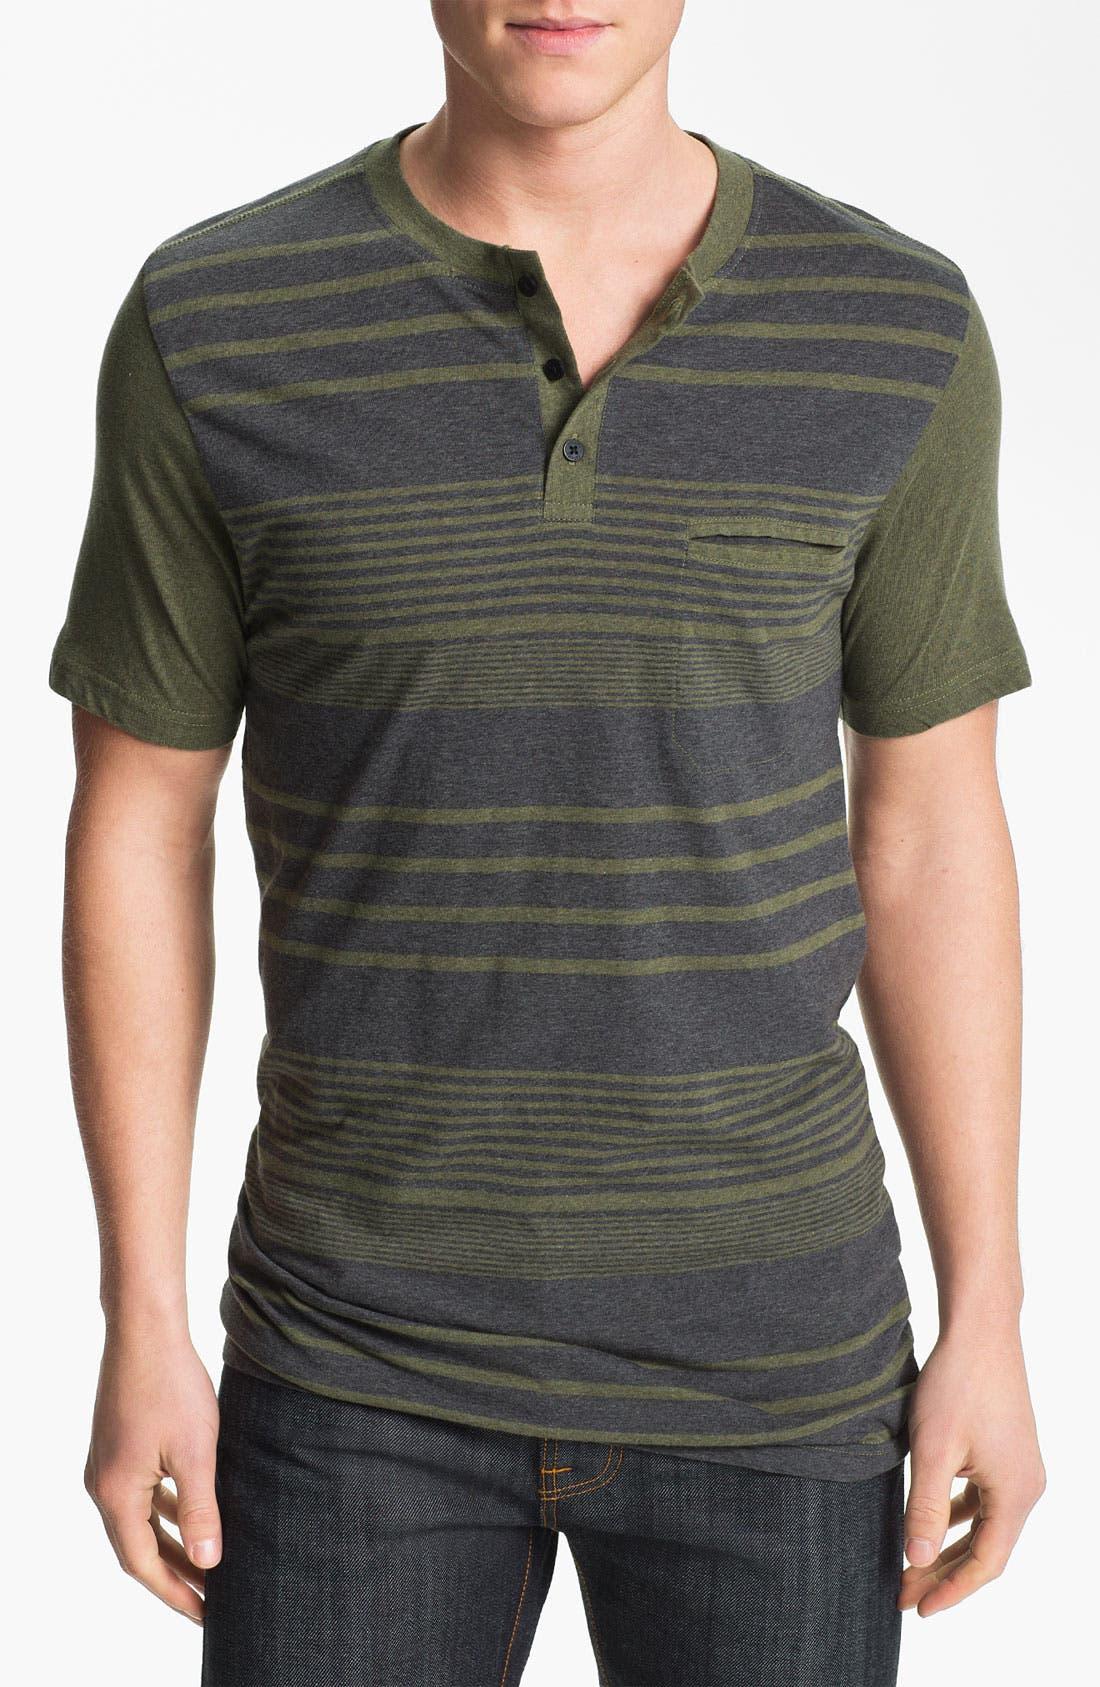 Alternate Image 1 Selected - Ezekiel 'Beachside' Stripe Henley T-Shirt